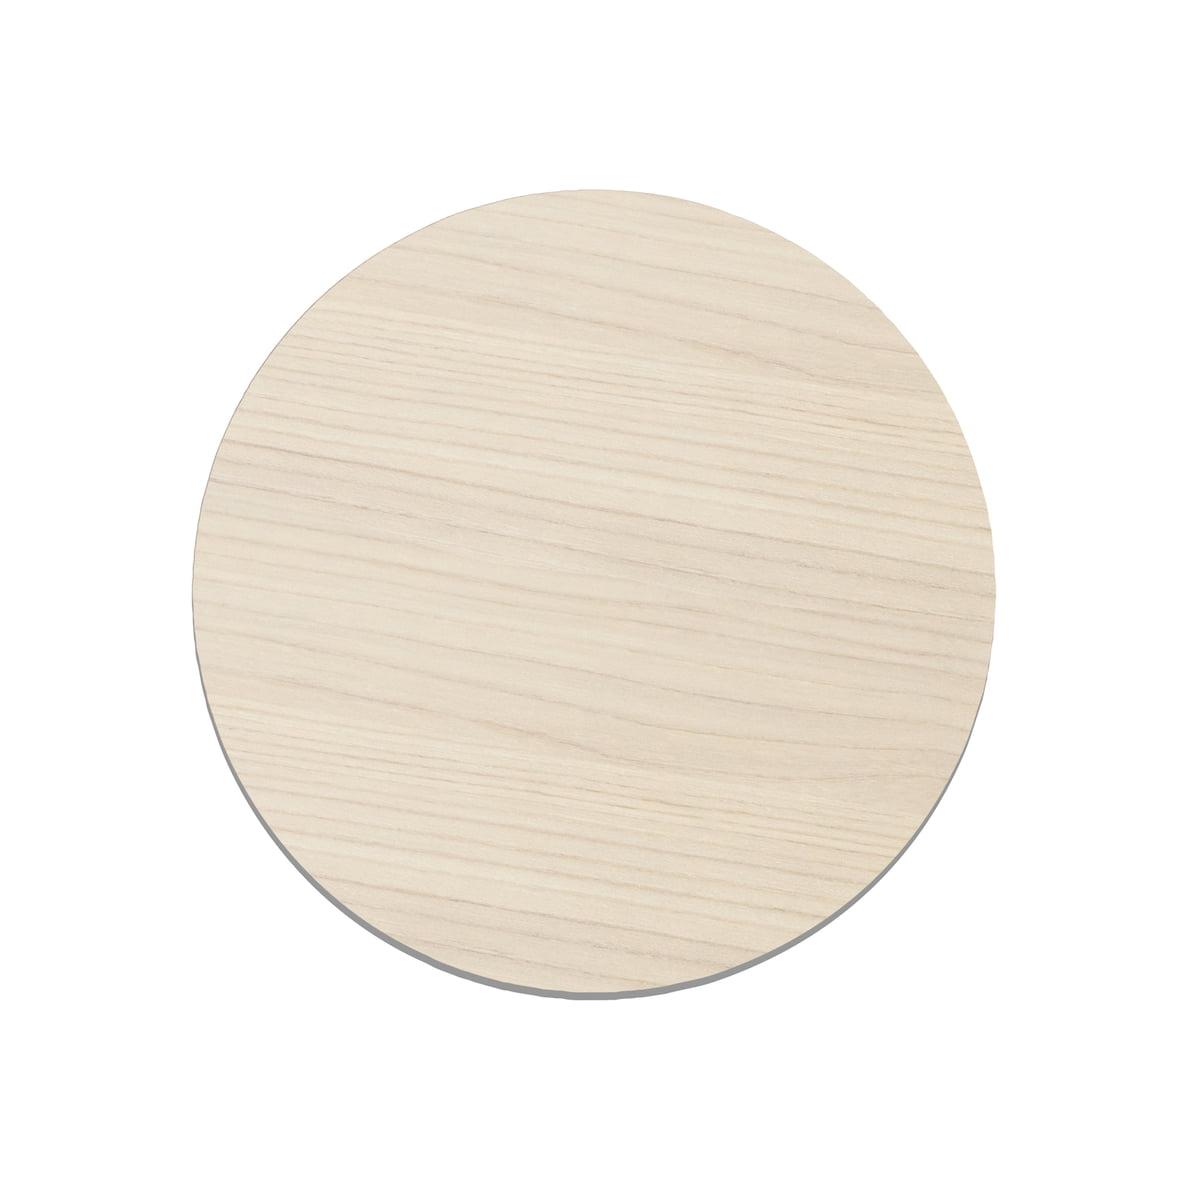 Linddna cut serve schneidebrett circle s dm 24 cm esche frei